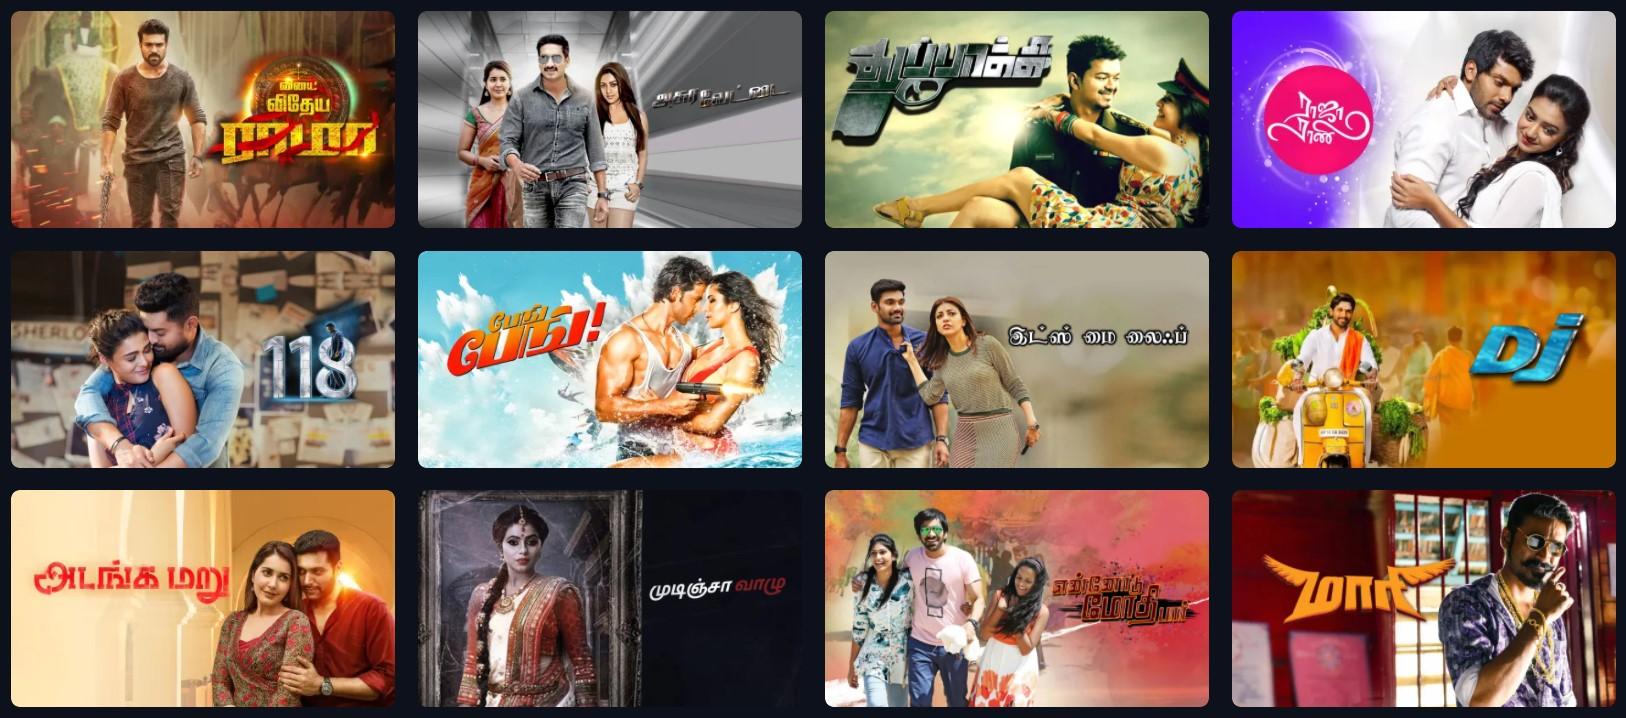 Tamilrockers 2020: Tamil Movies Download HD & Free Download Tamil Movies 720p, 1080p